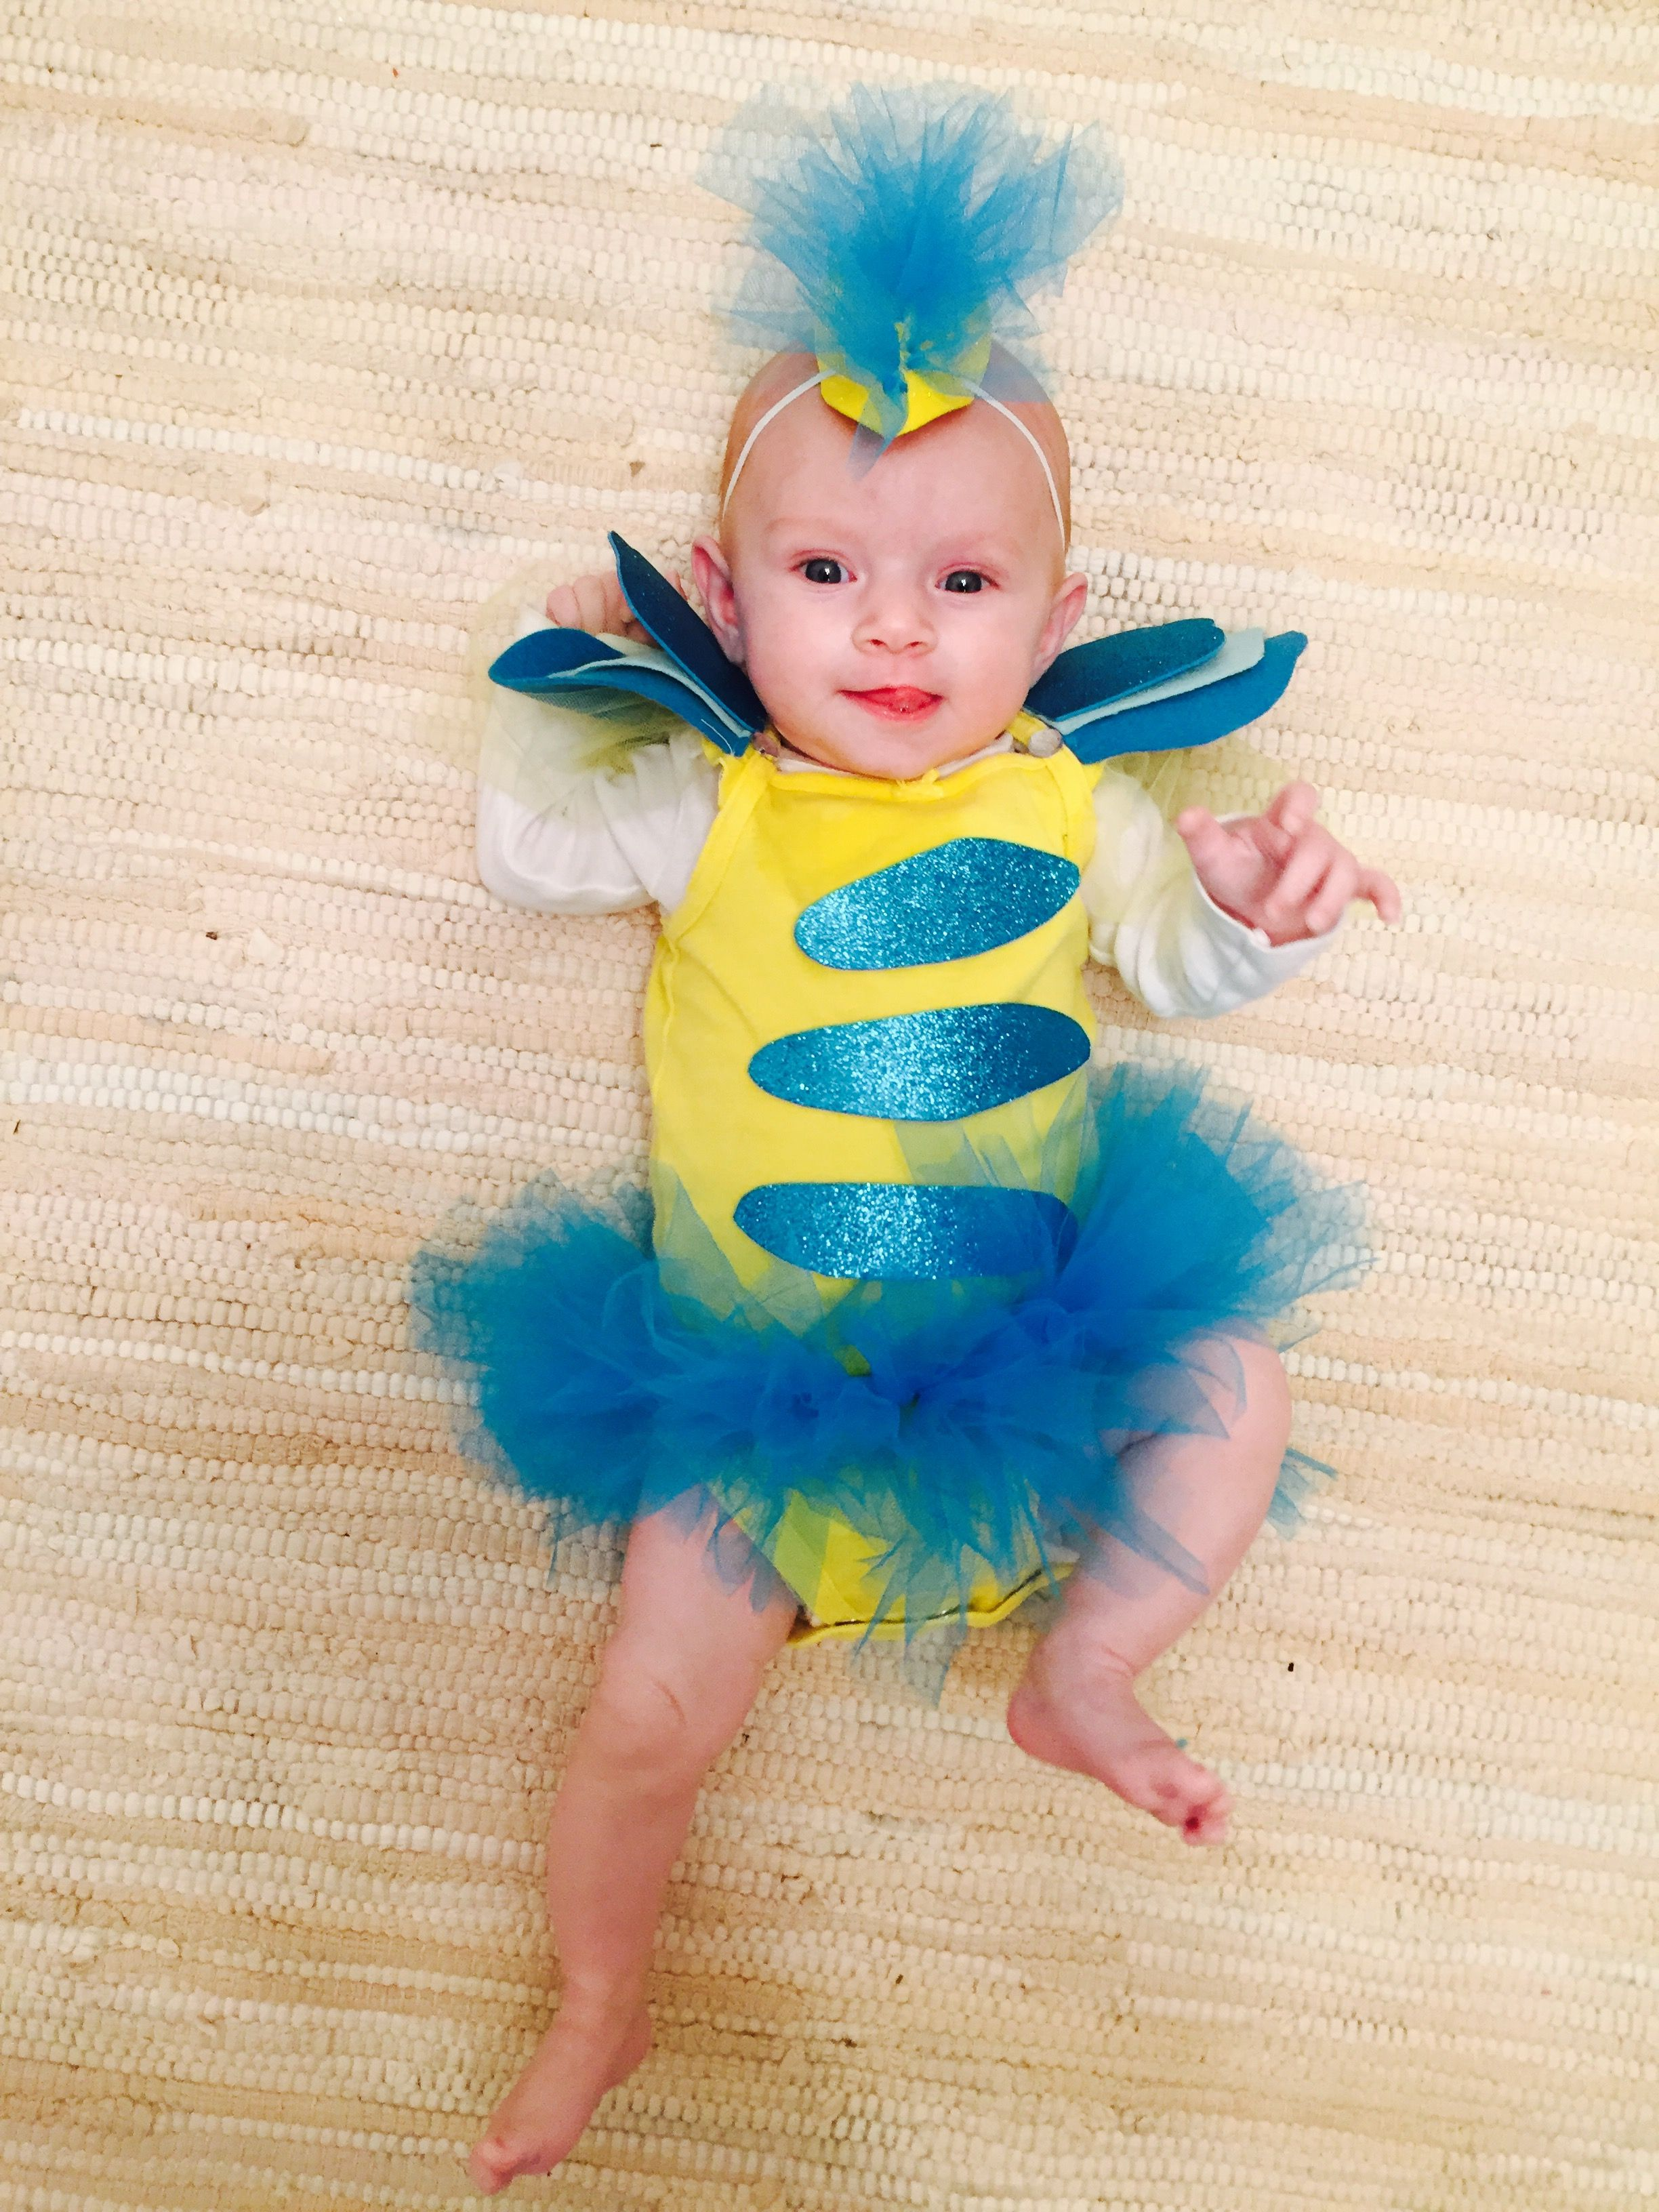 Ariel diy costume full diy mermaid costume post - Baby Flounder Costume Diy Littler Mermaid